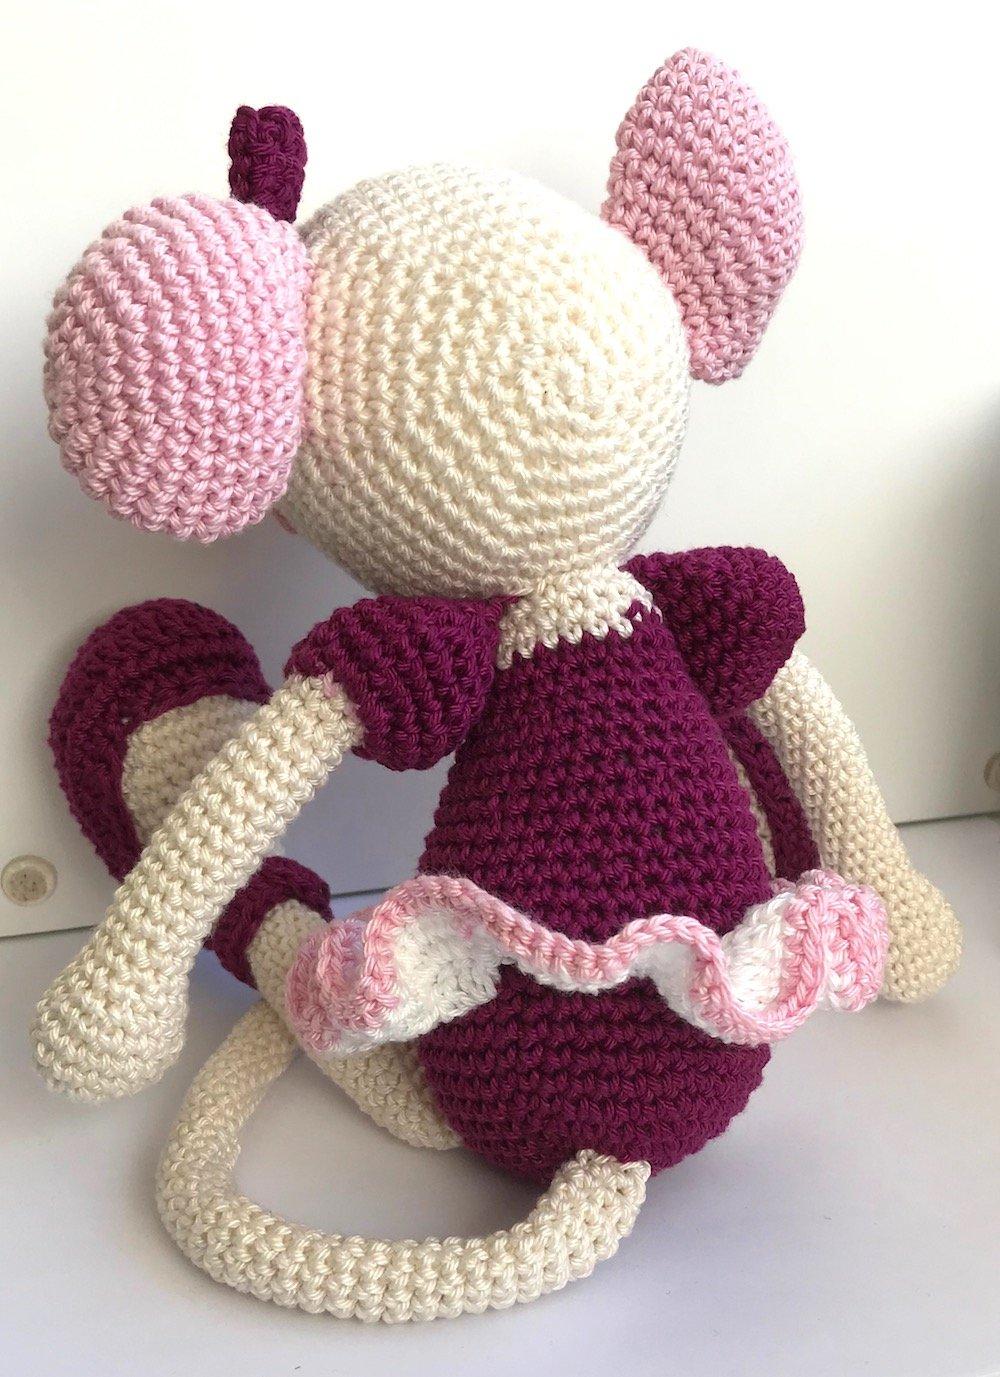 Mia the Ballerina Mouse - Crochet Amigurumi Plushie Soft Toy - BABY ...